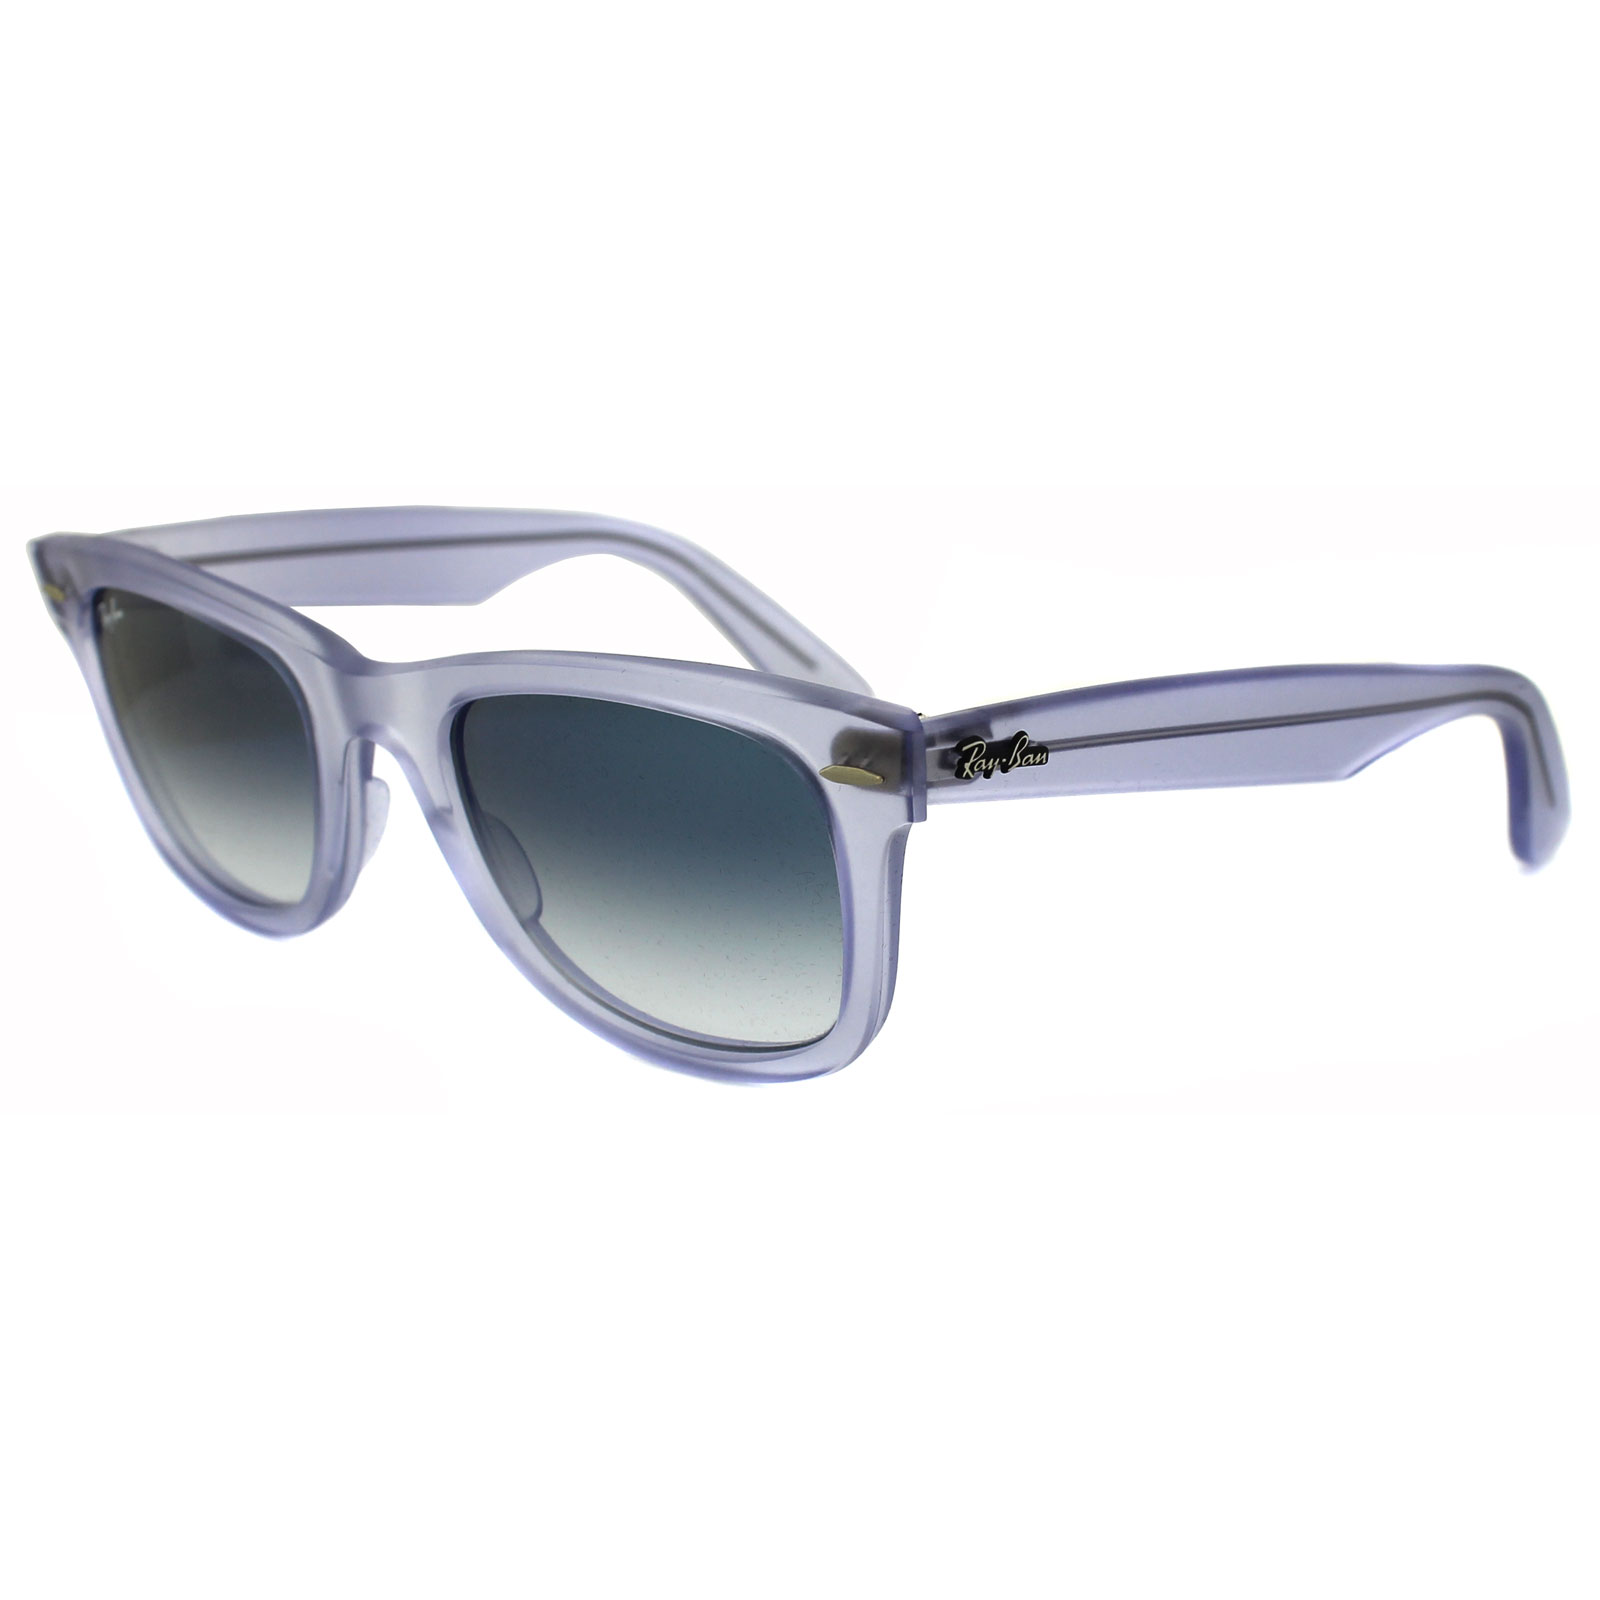 ray ban lunettes de soleil wayfarer 2140 60603f glace l 39 eau raisins lilas bleu ebay. Black Bedroom Furniture Sets. Home Design Ideas